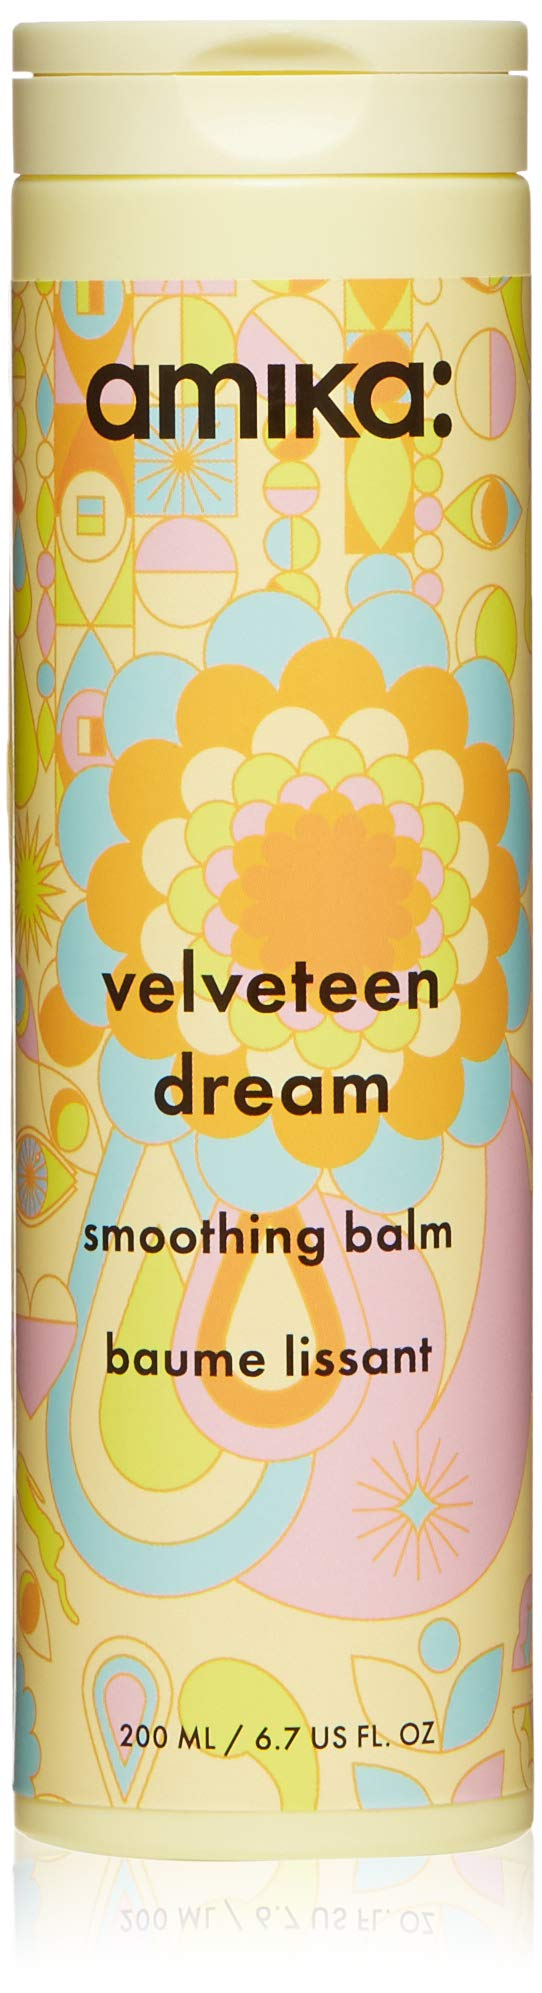 amika Velveteen Dream Smoothing Balm, 6.7 oz by amika